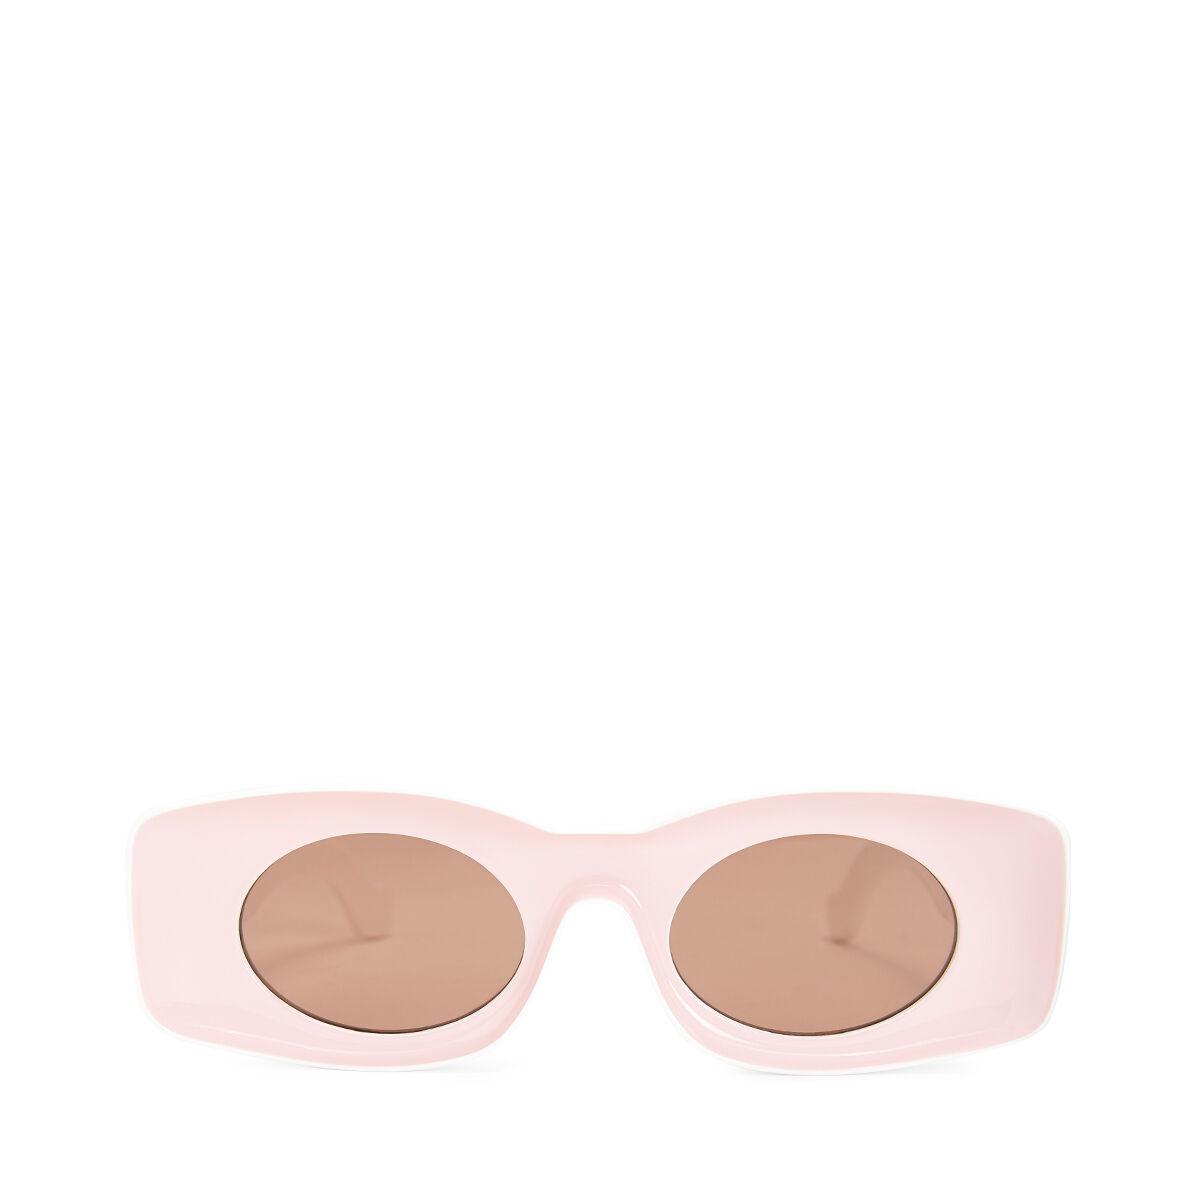 LOEWE Gafas Paula Rosa/Blanco front